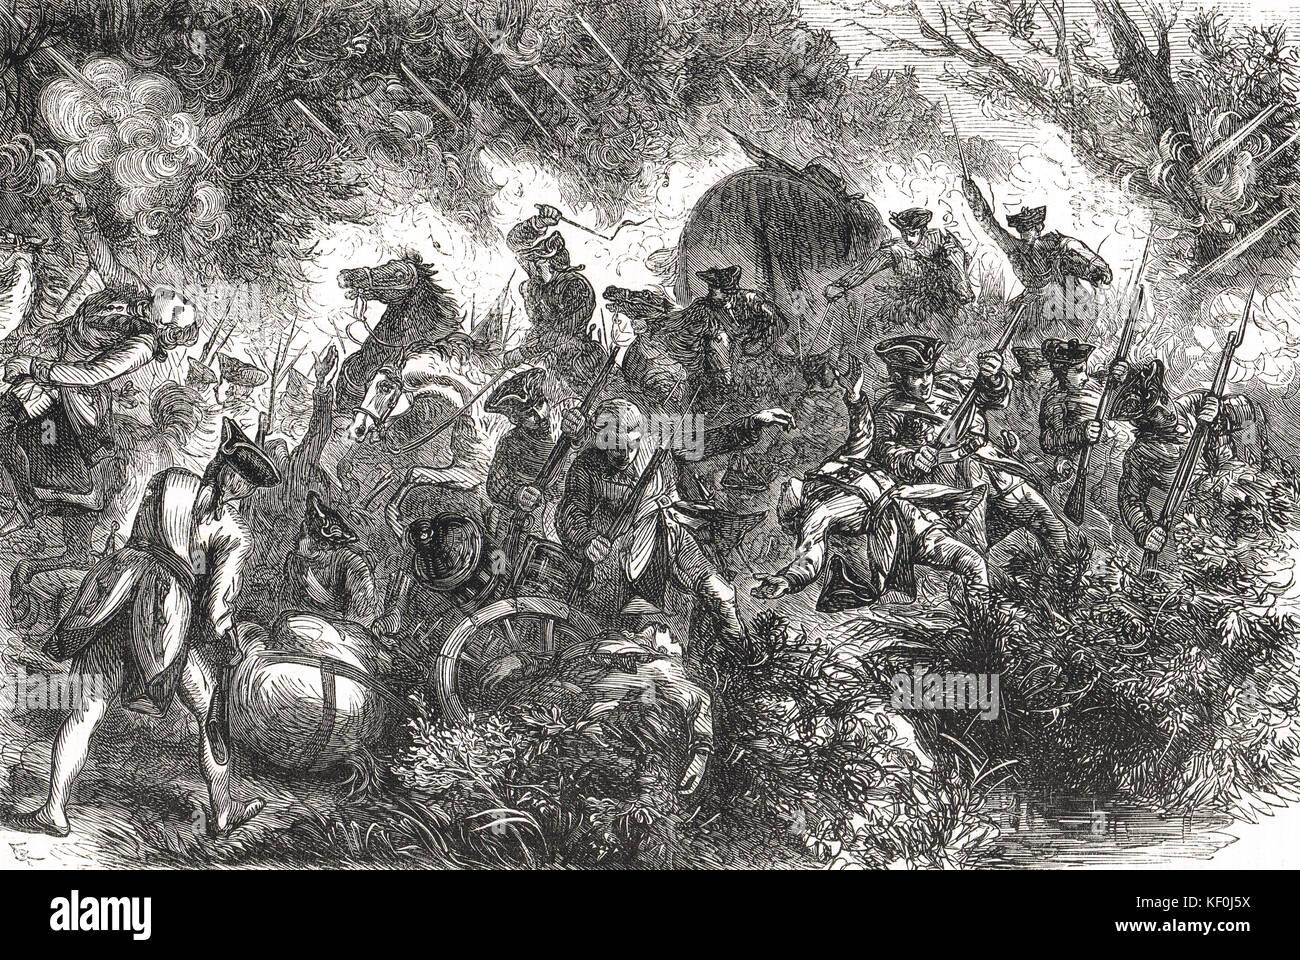 Battle of the Monongahela, 9 July 1755 (Braddock's Defeat). - Stock Image